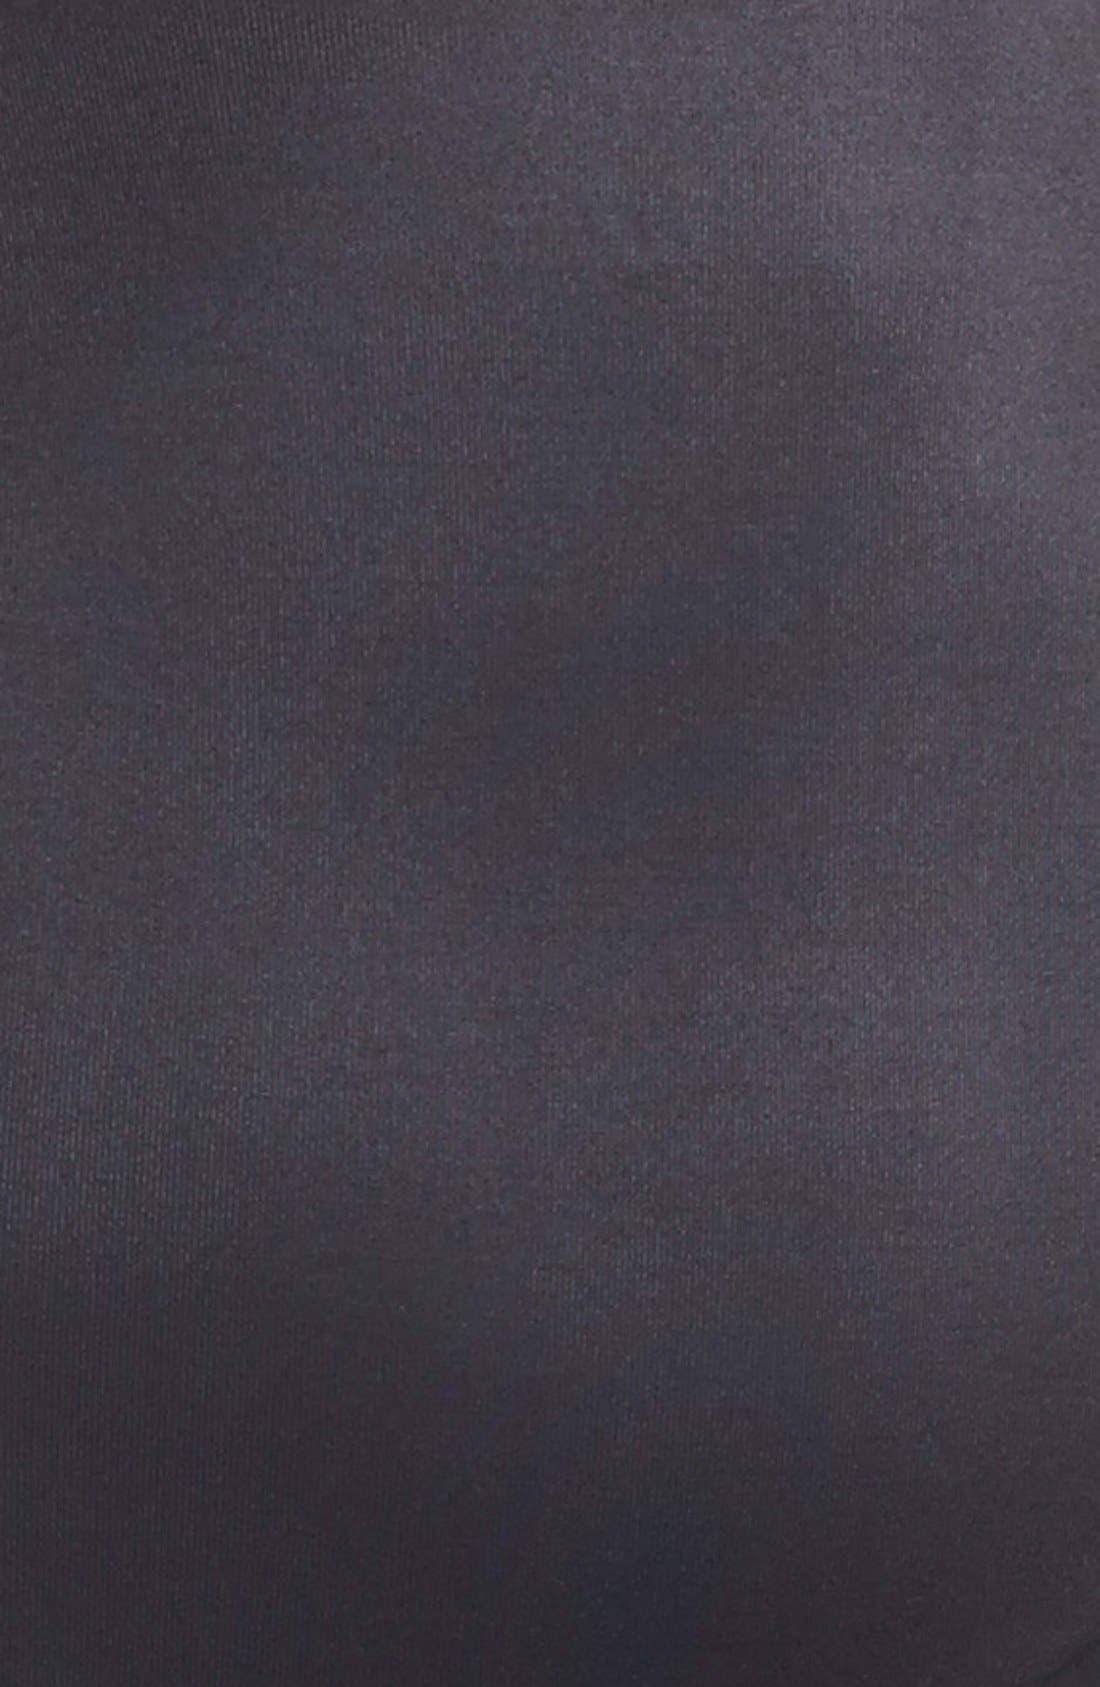 Torsette Underbust Mid Thigh Bodysuit Shaper,                             Alternate thumbnail 9, color,                             BLACK